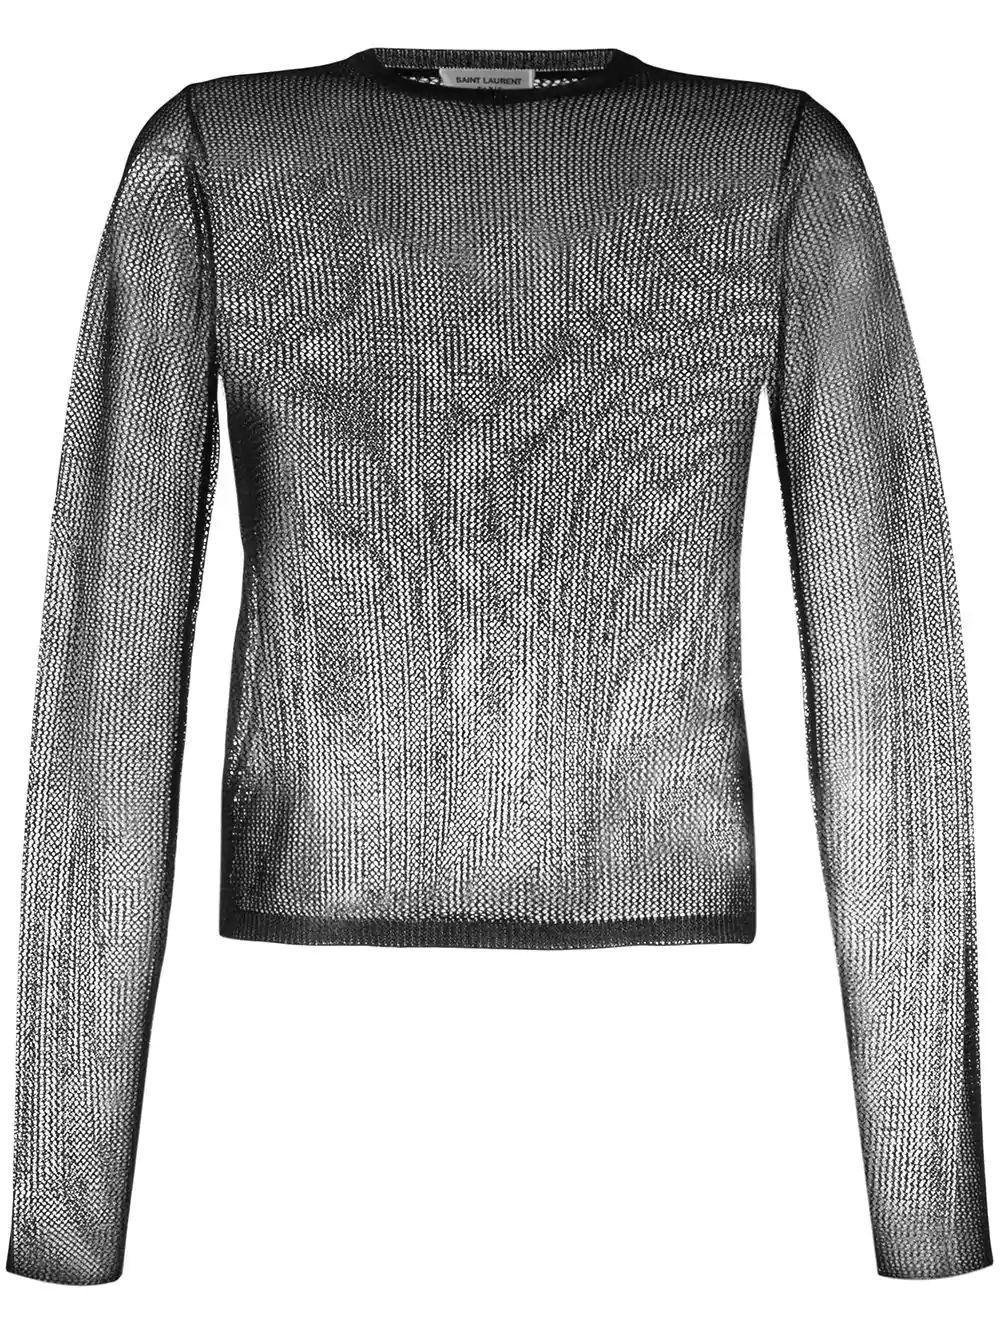 Long Sleeve Sequin T- Shirt Item # 589351YAIG2